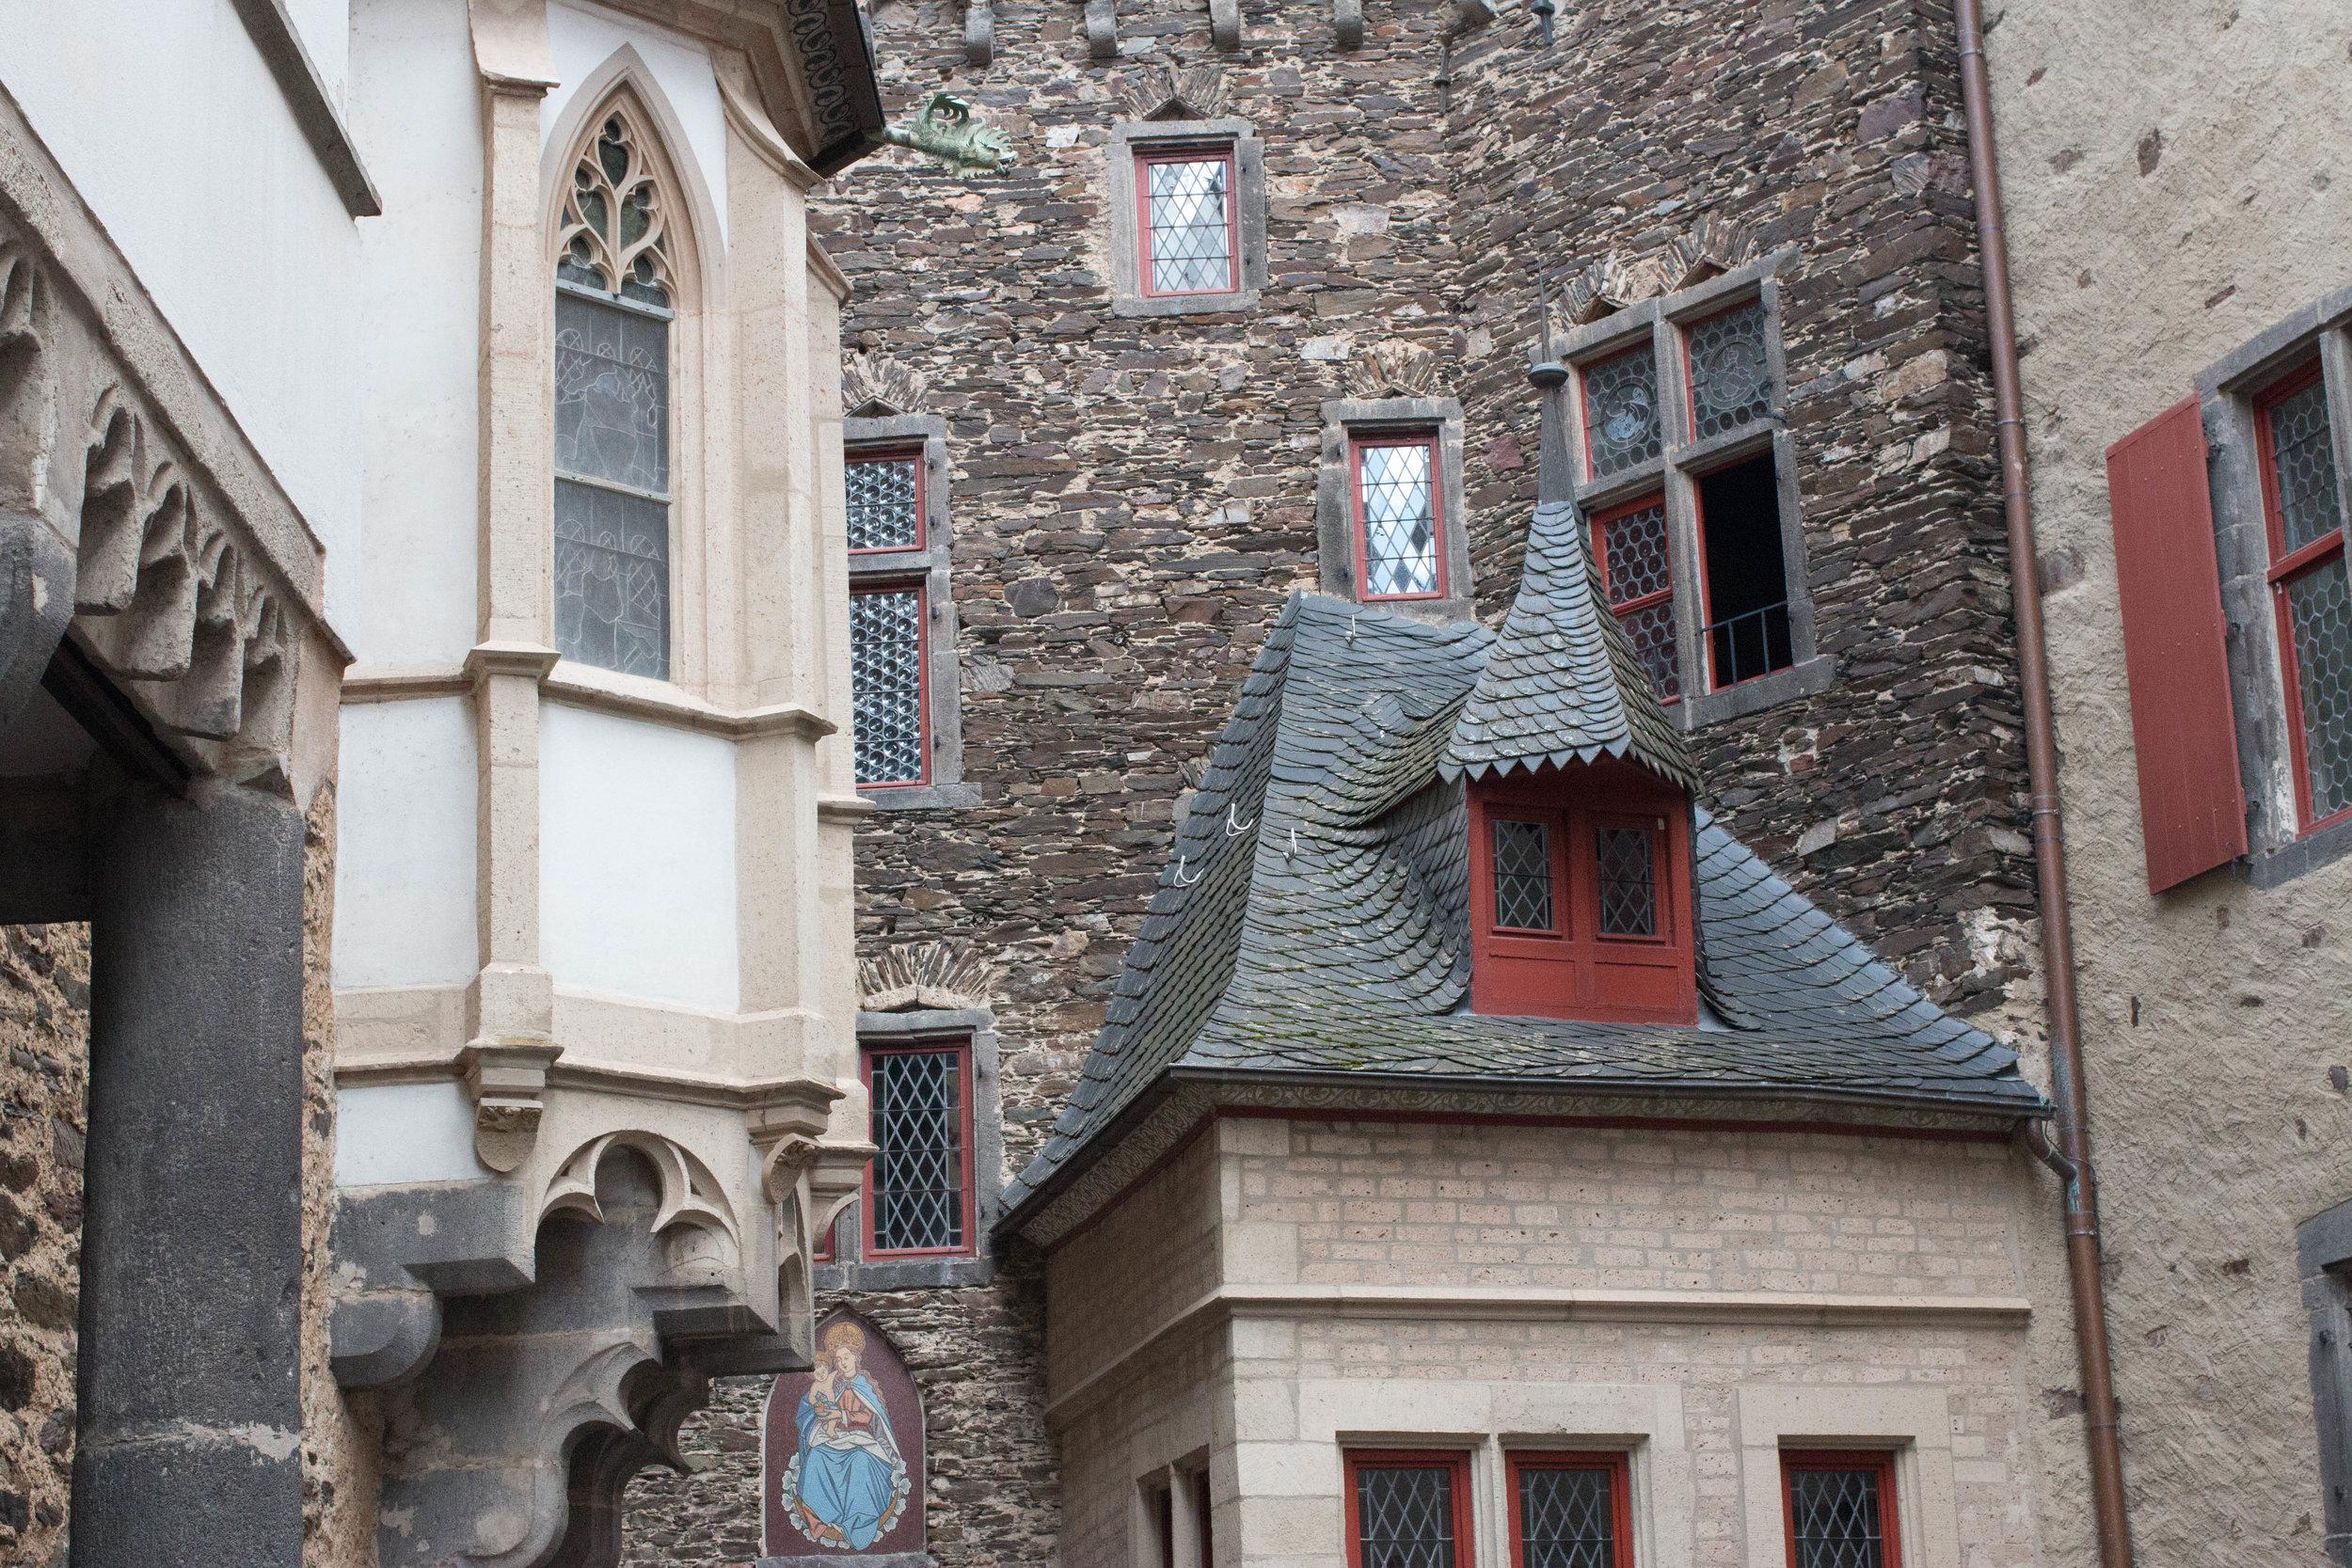 Three brothers - three distinct architecture styles